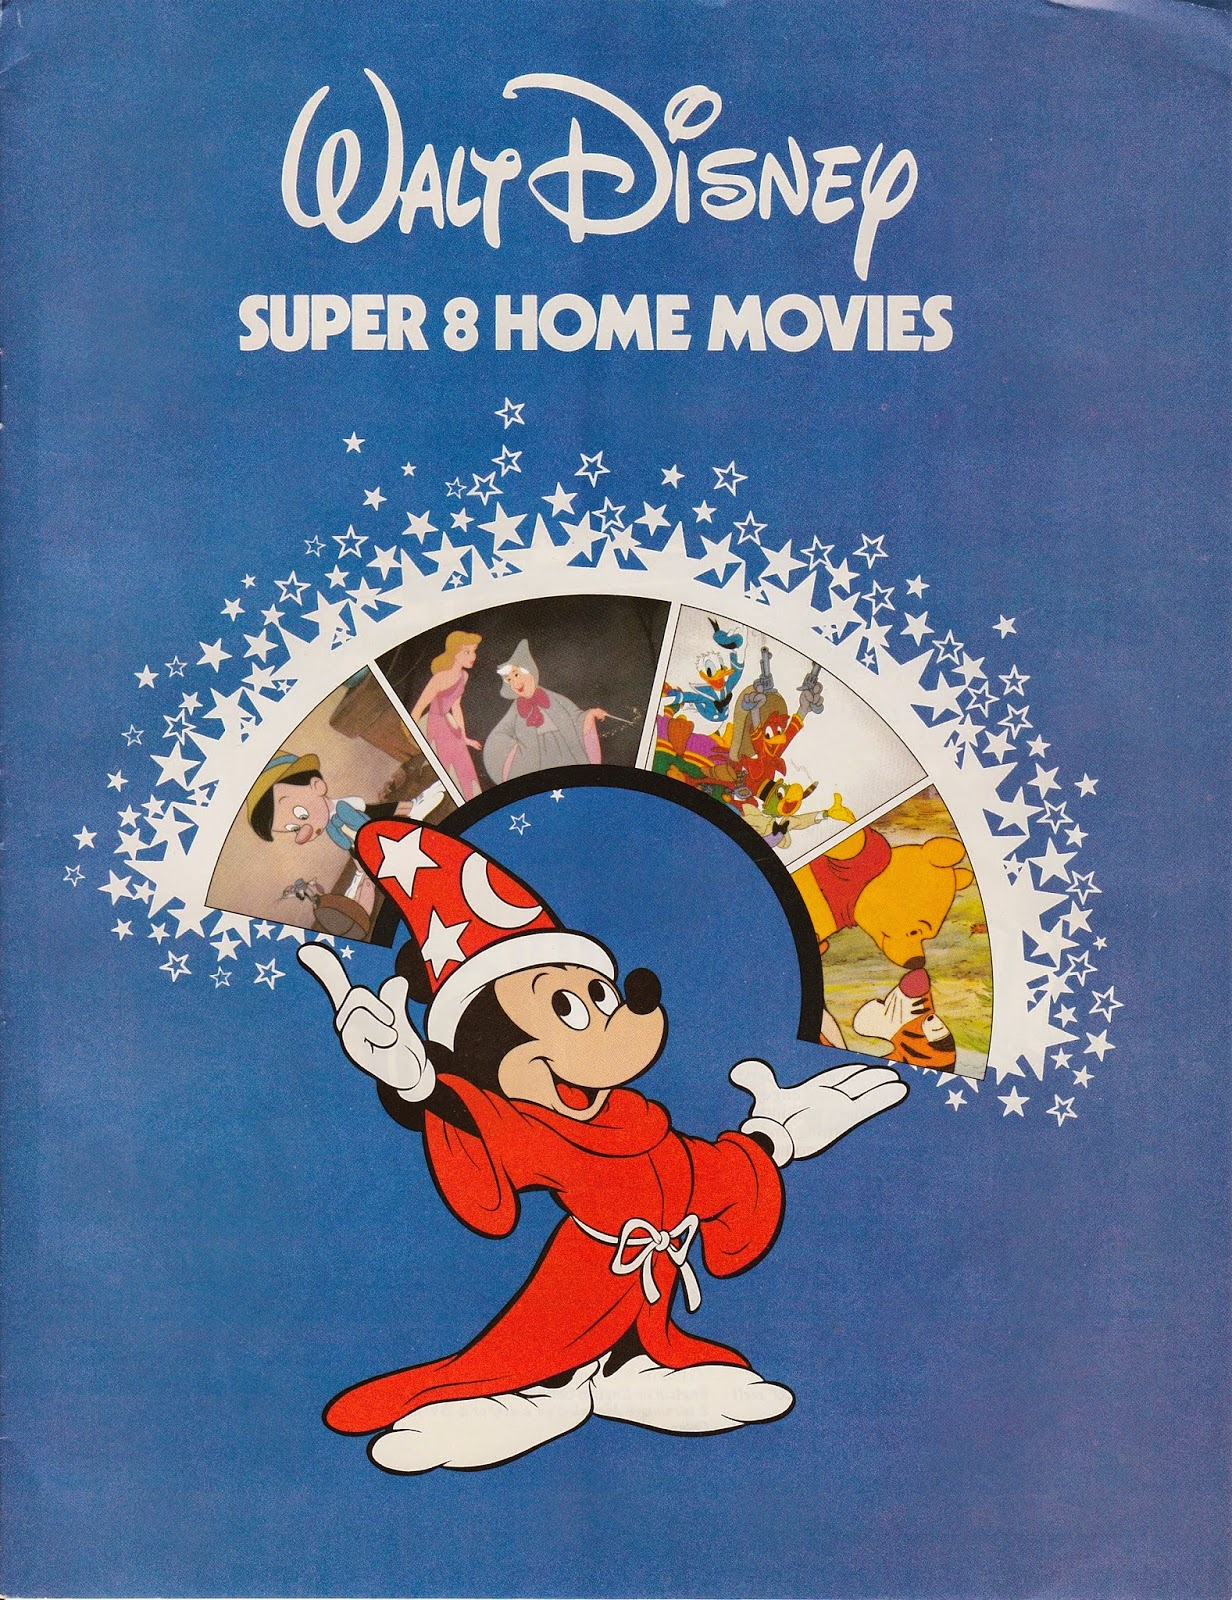 Walt Disney Super 8 Home Movies